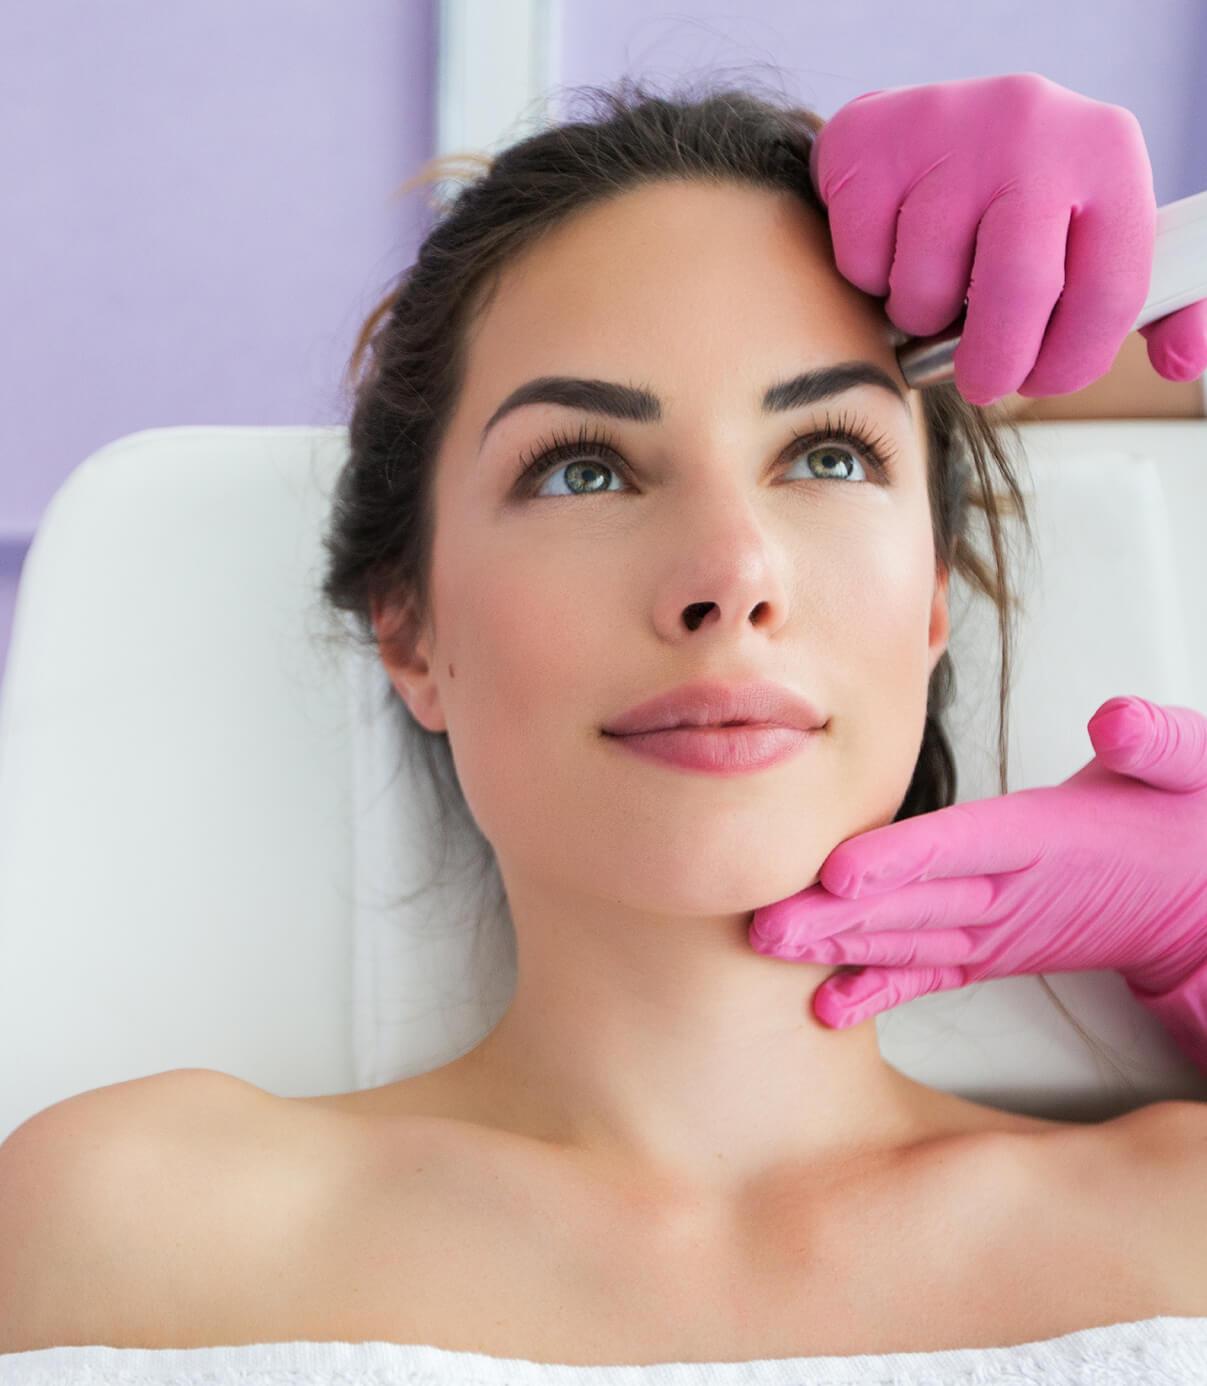 Causes of Wrinkles And Skin Sagging